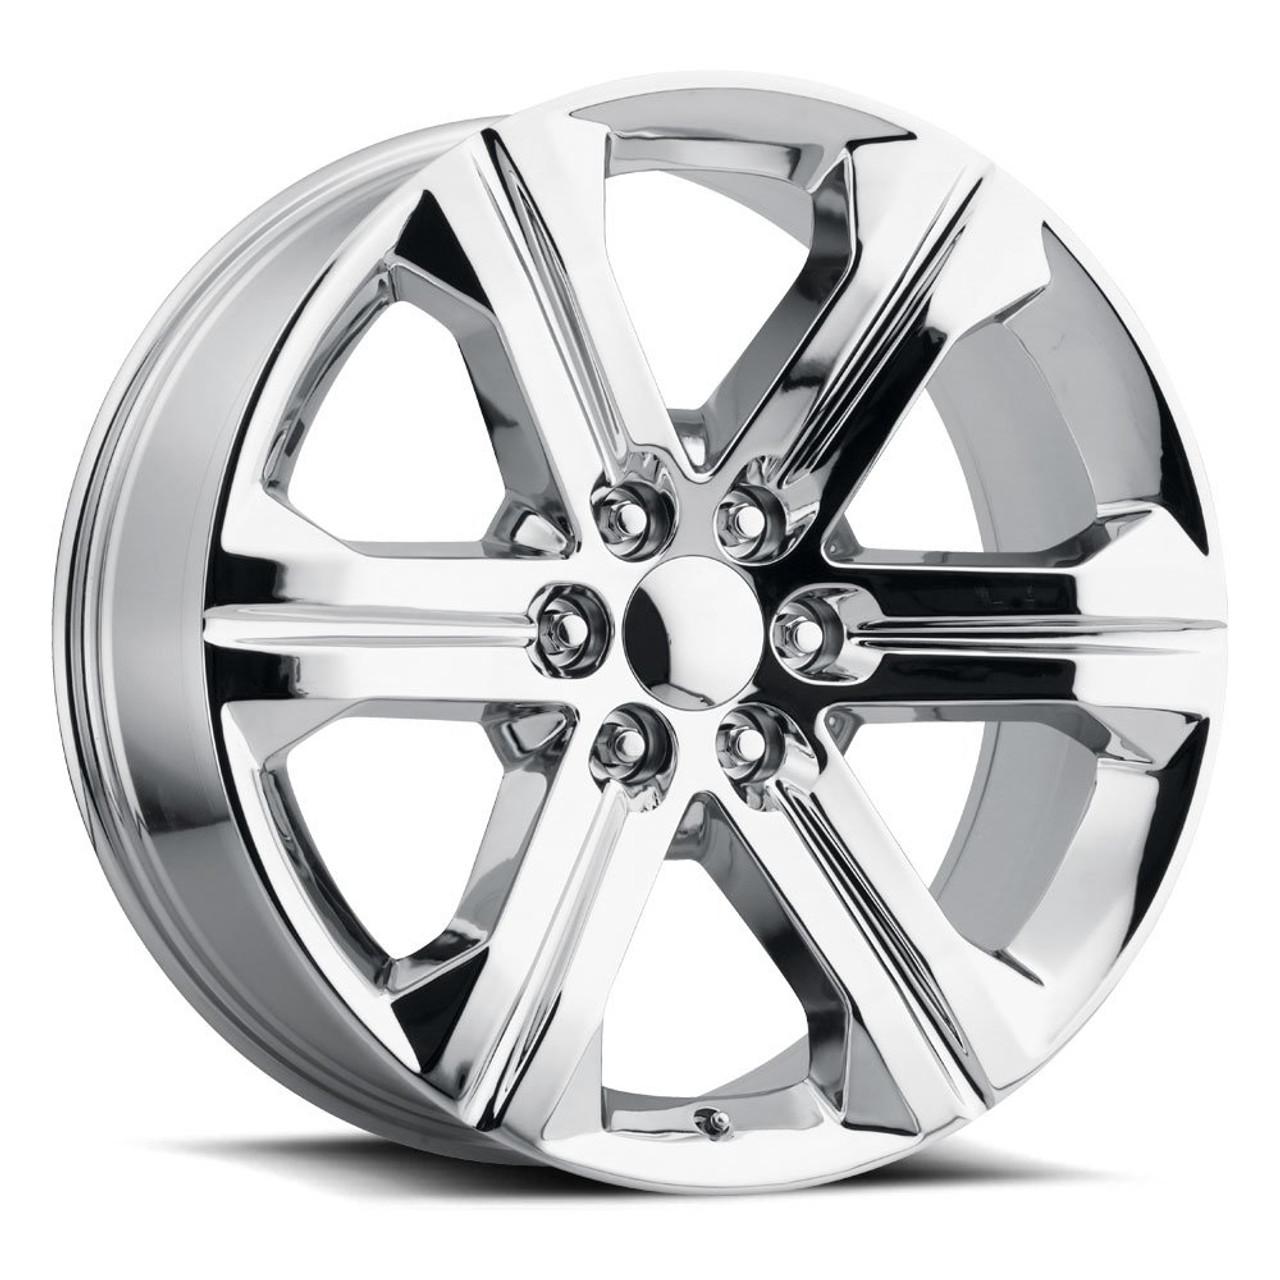 "22"" New 2018-19 Fits Chevrolet Escalade GMC Denali Wheels ..."